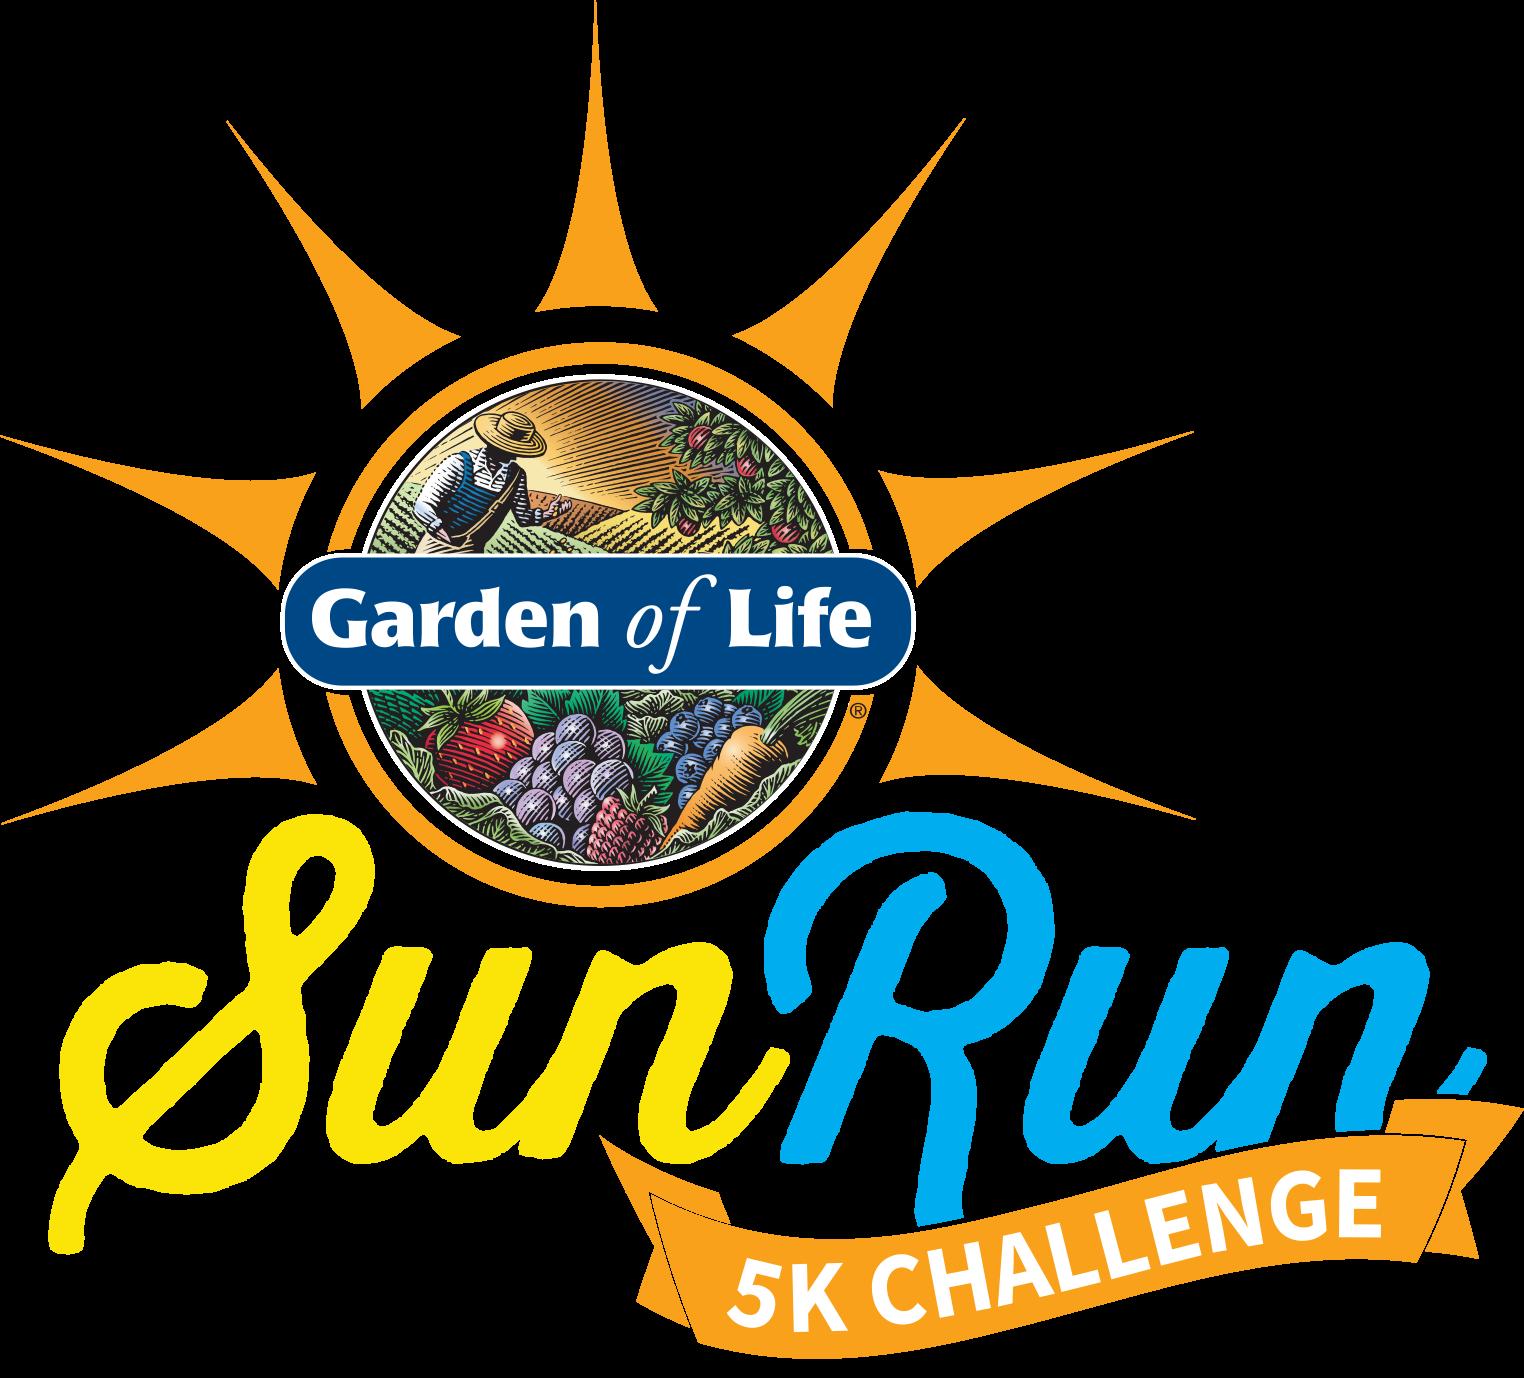 Garden of Life 5K | April 13, 2019 - PGA National, Palm Beach